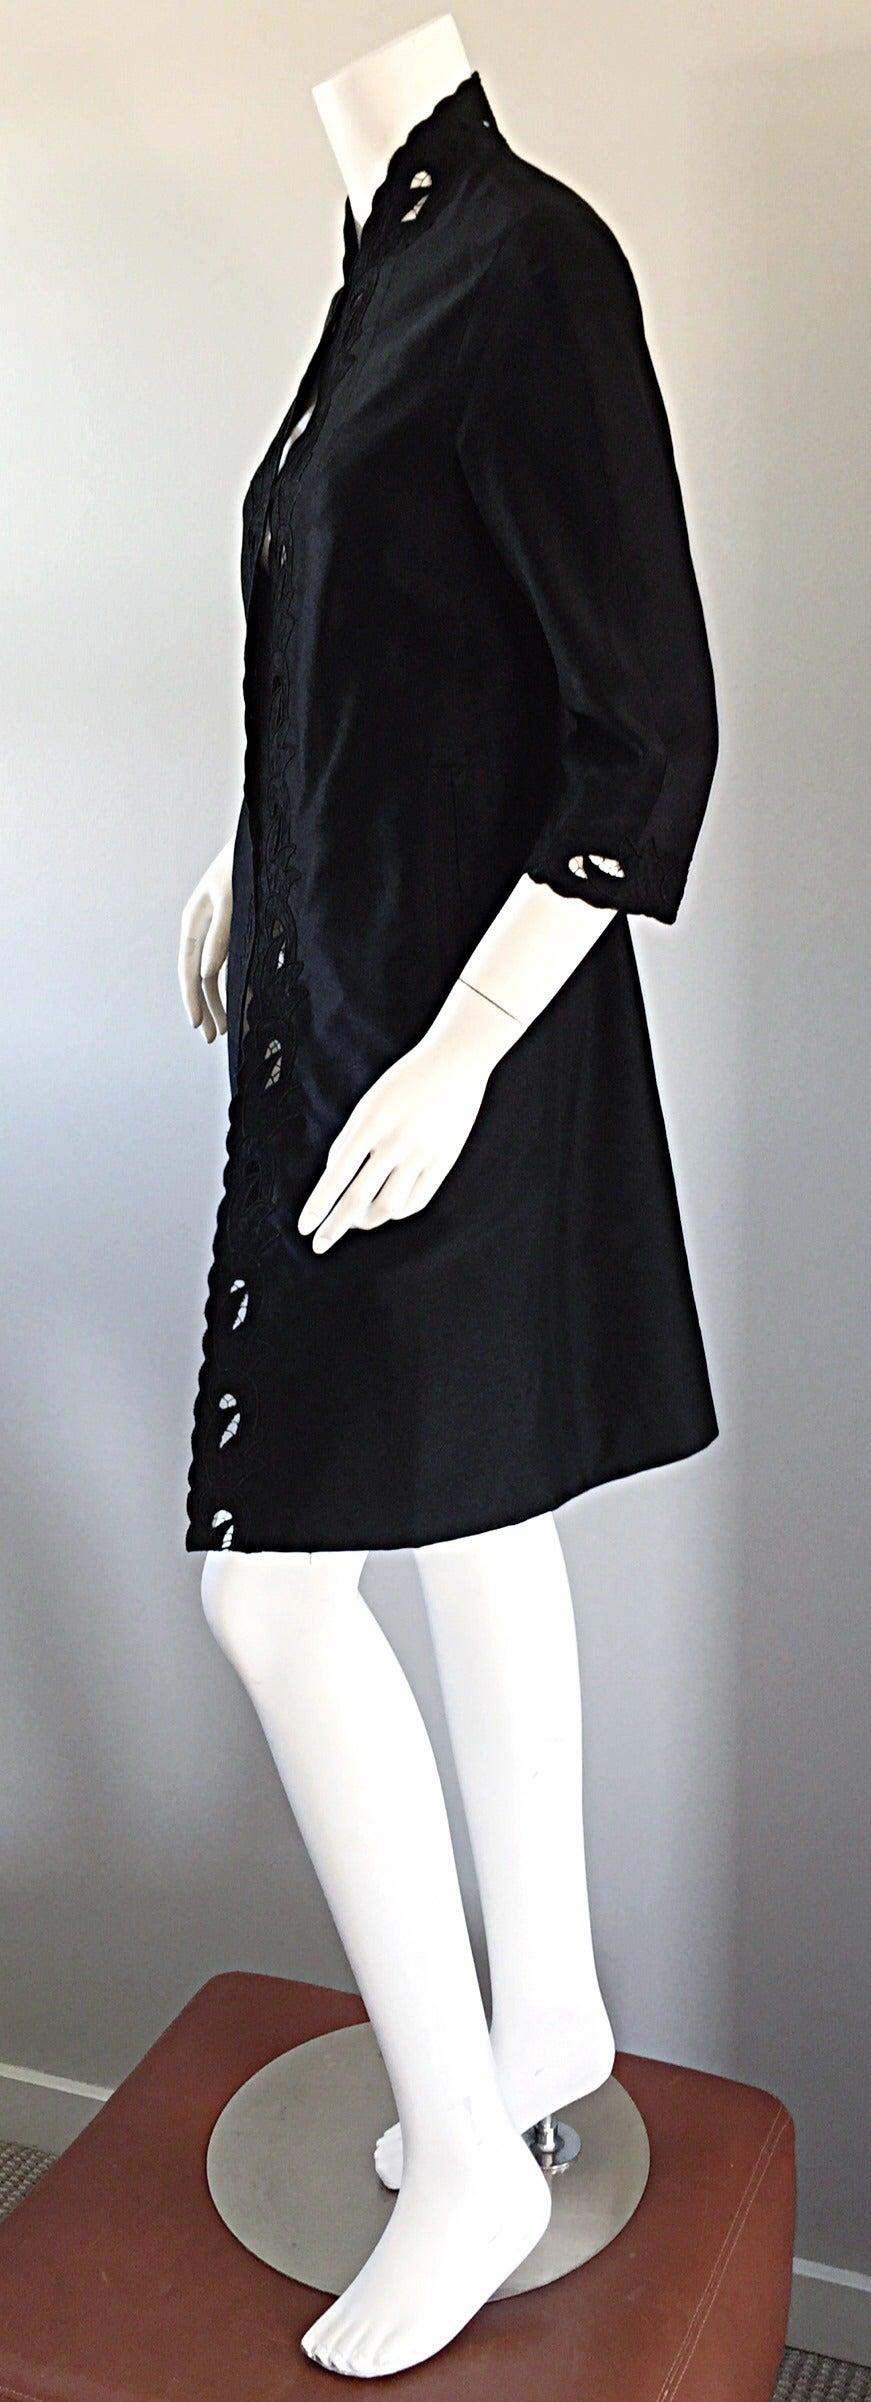 Chic 1940s Black Duster / Opera Jacket w/ Crochet Details + Scalloped Edges 8